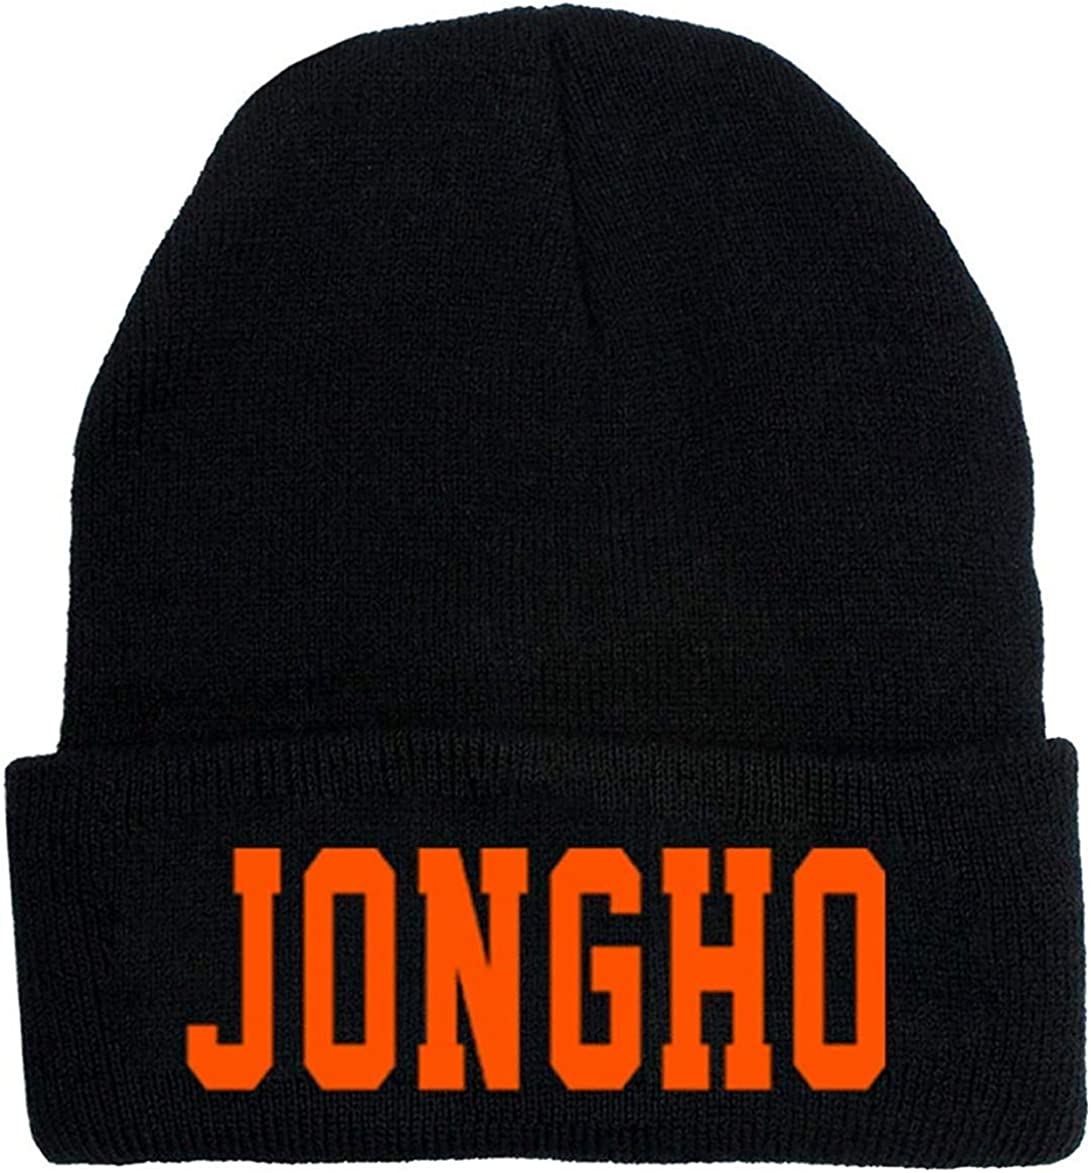 aixingwuzi Fiable Nuevo /álbum de Punto Invierno Caliente Sombrero Hongjoong Seonghwa Yunho Yeosang San Mingi Wooyoung Jongho Ateez Firma Gorro Unisex